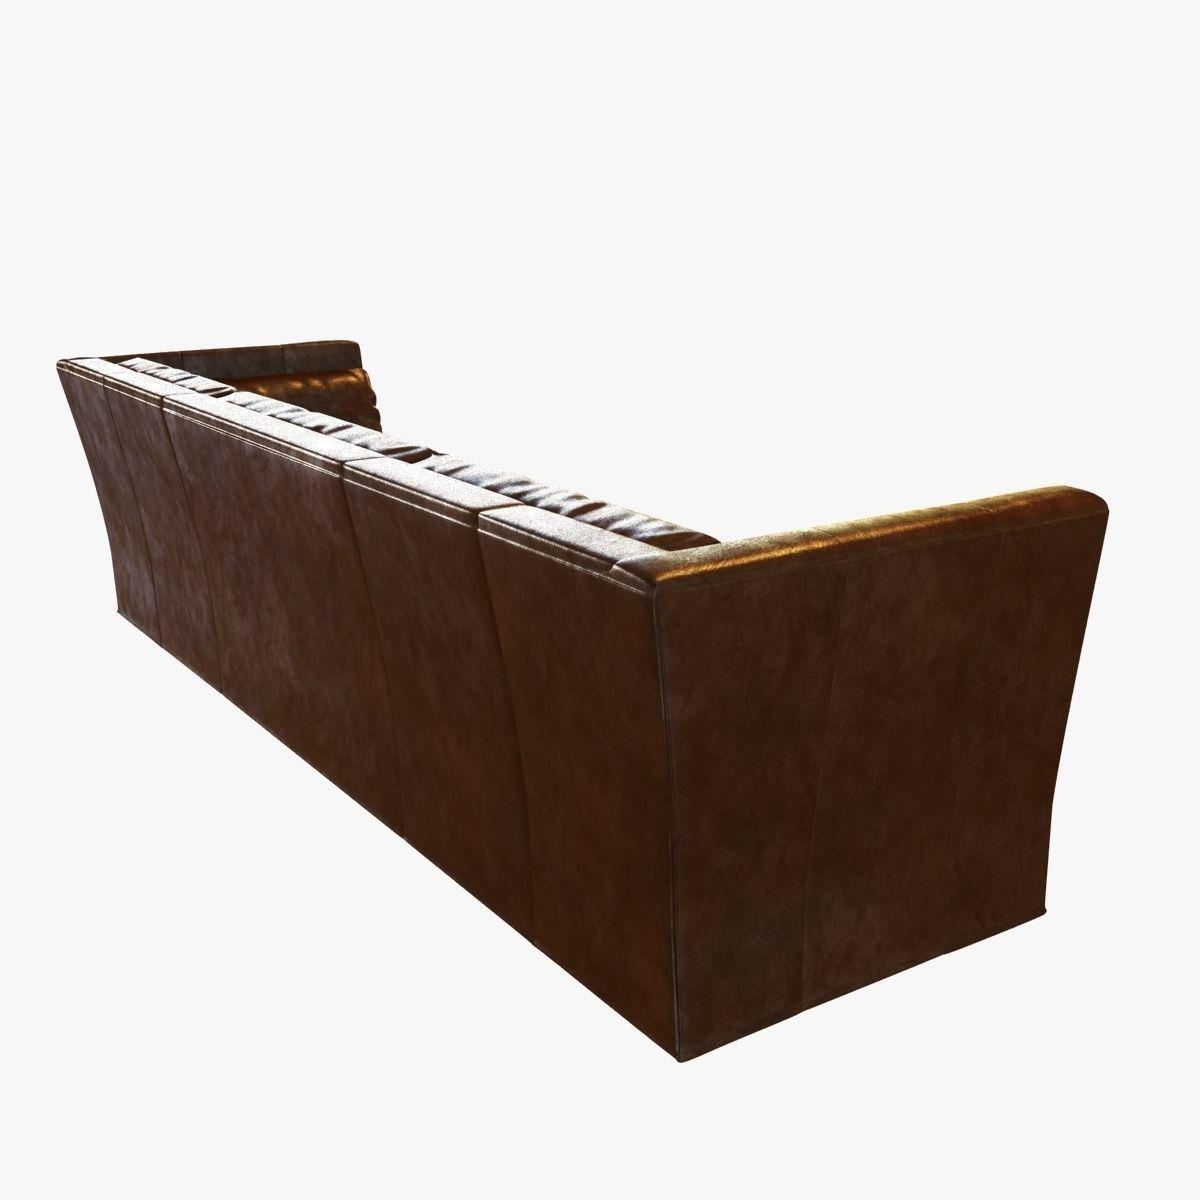 belgian shelter arm sofa curved sectional modern restoration hardware leather 3d